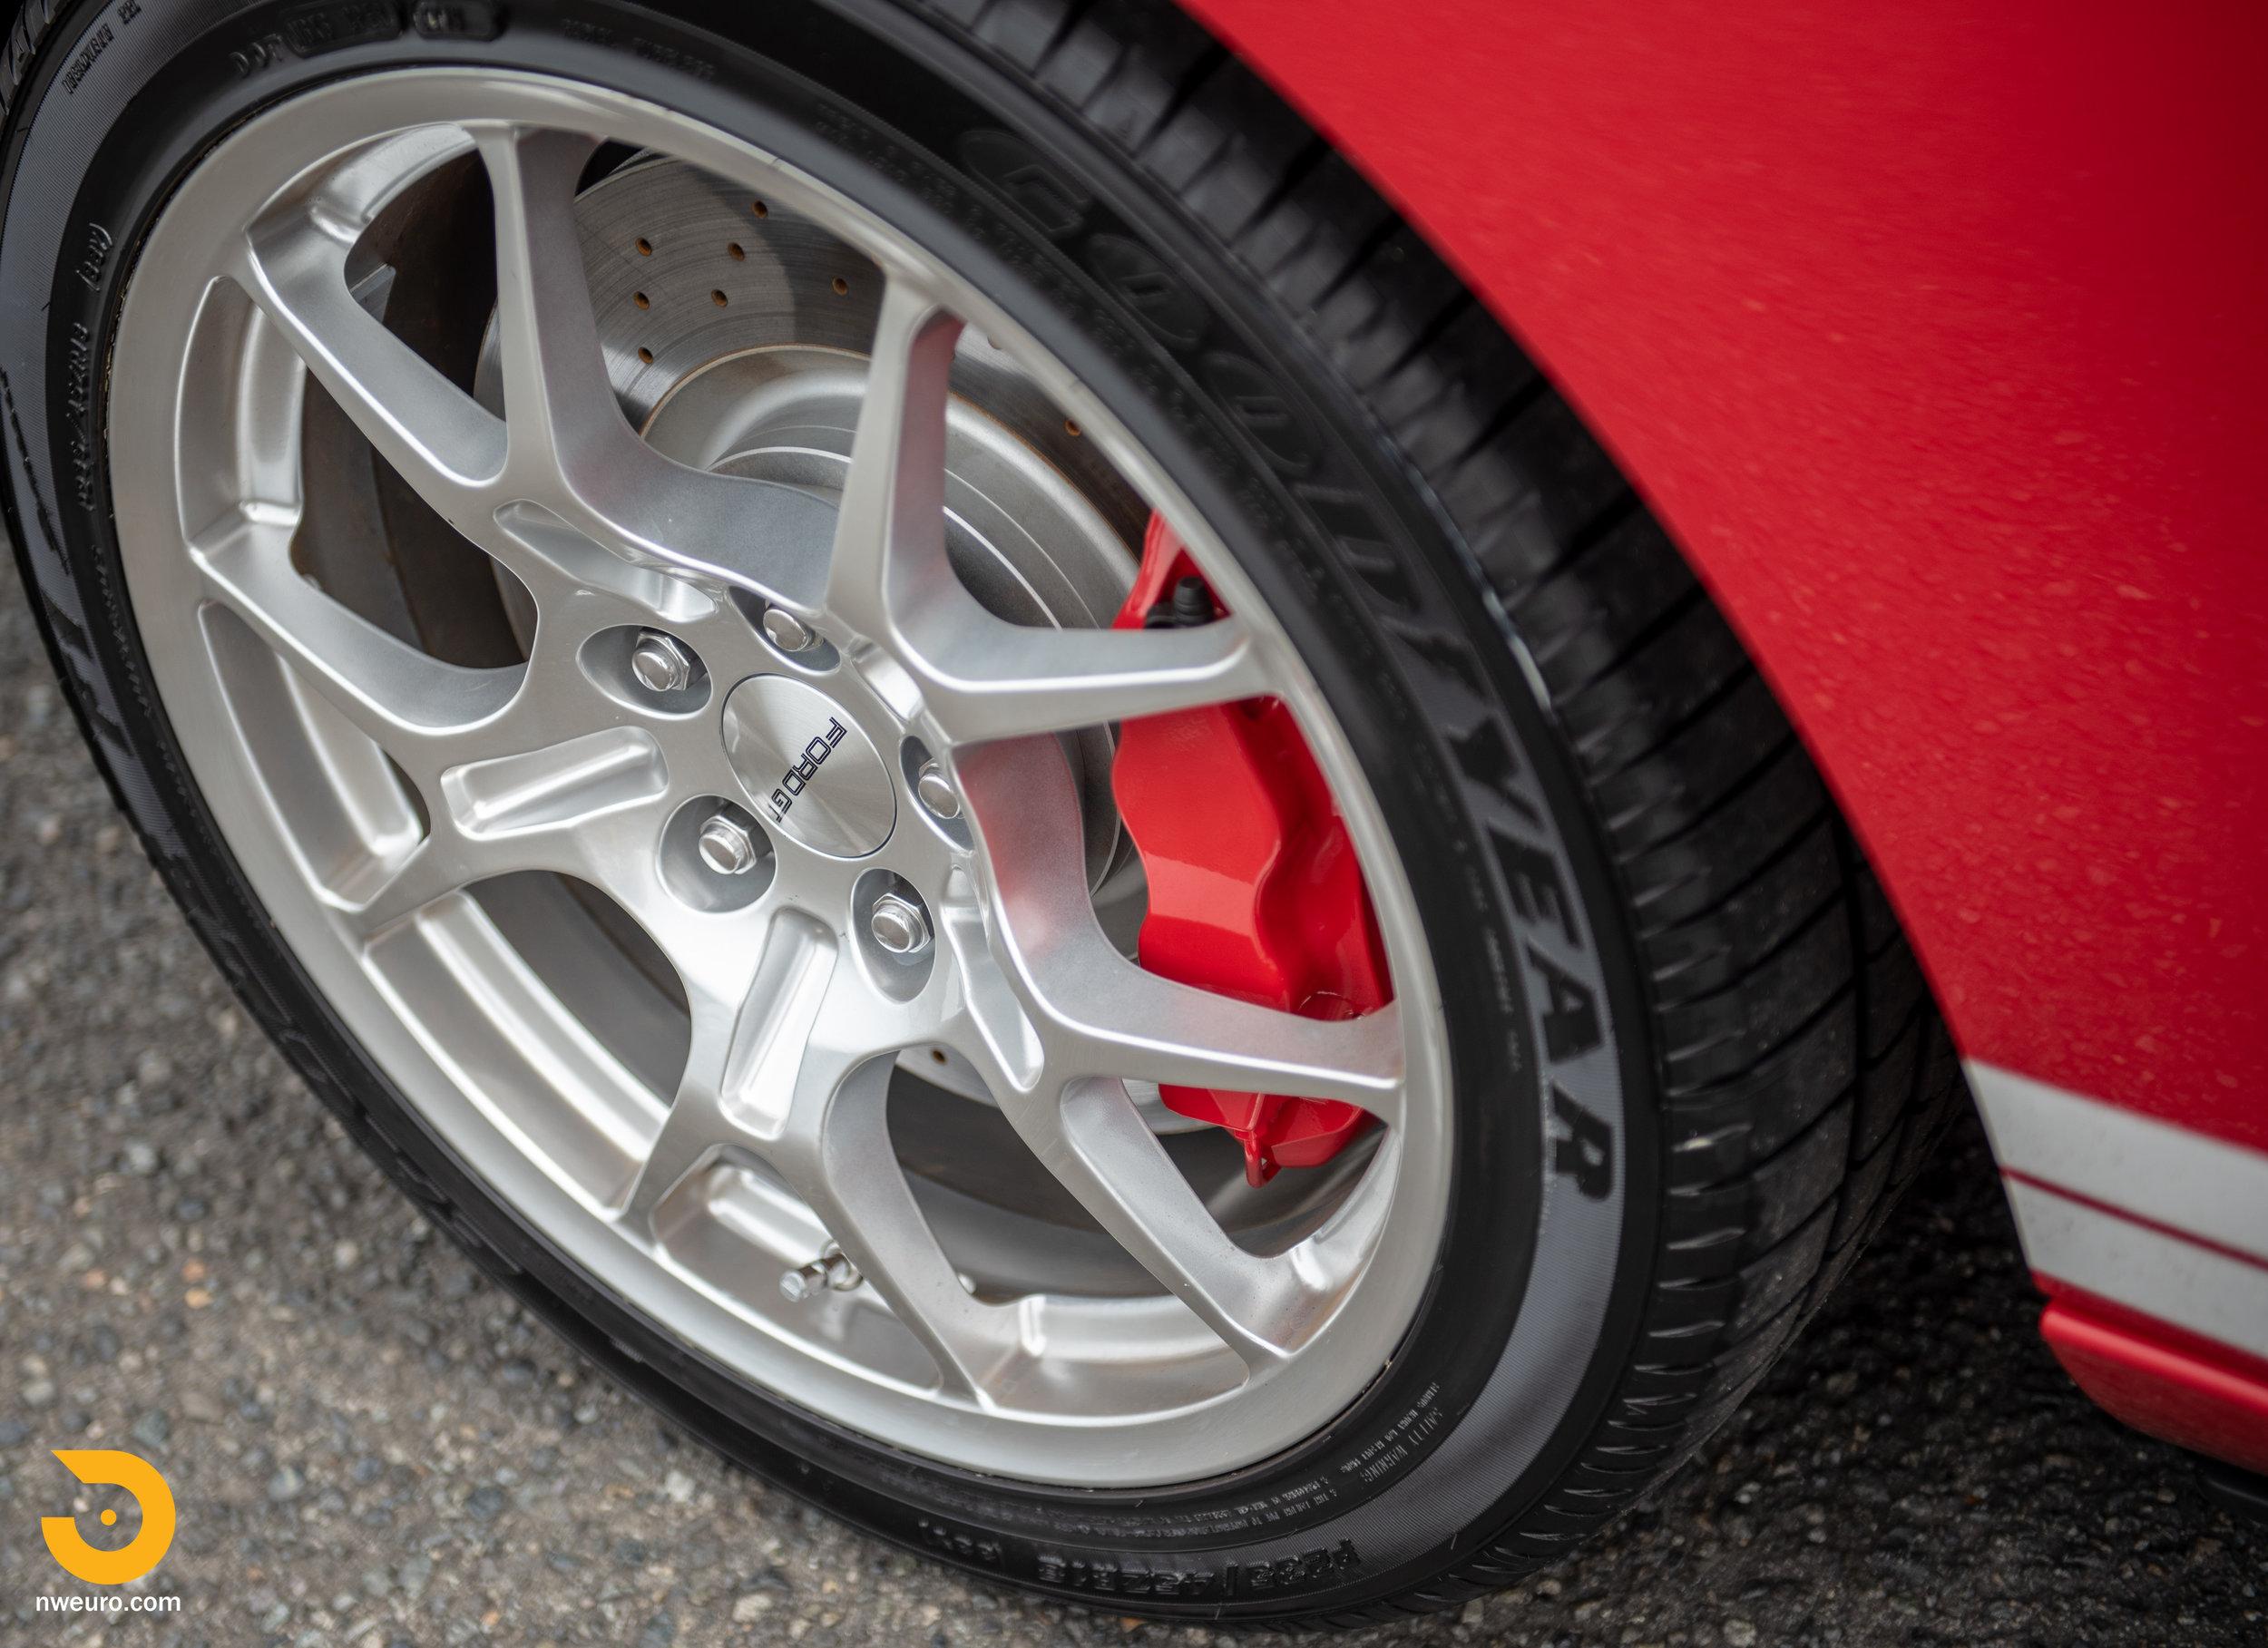 2005 Ford GT Red-67.jpg